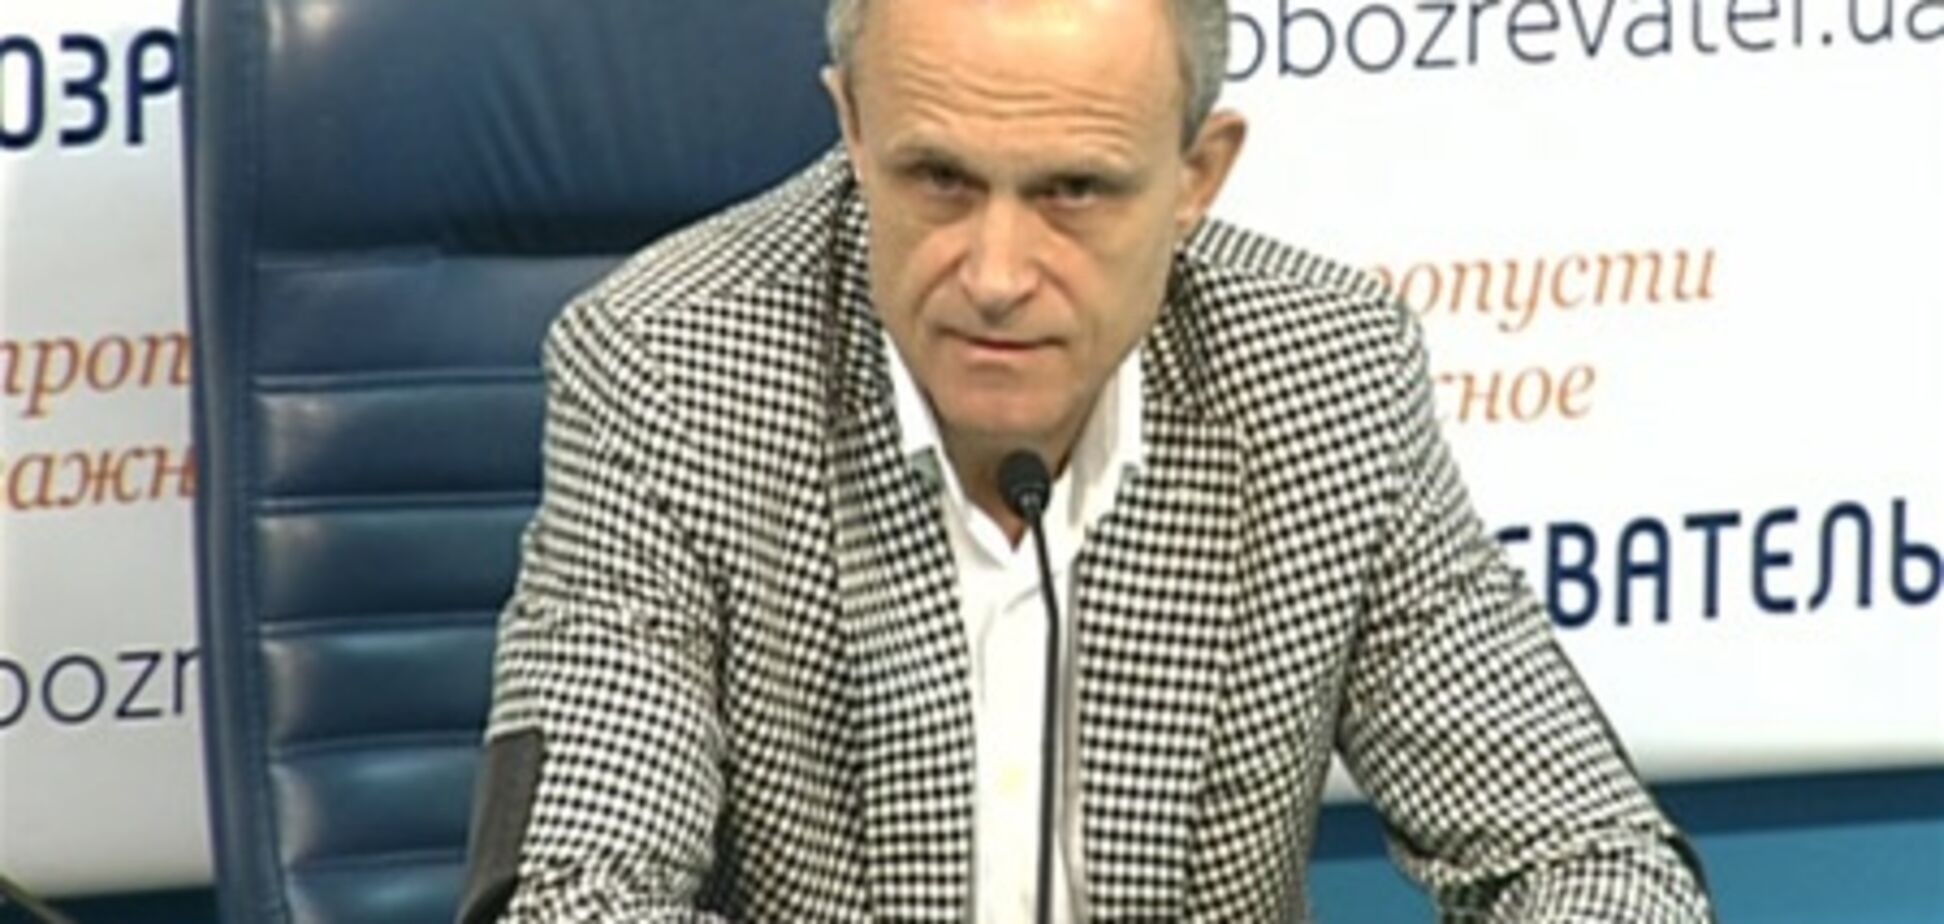 Фанаты Евро-2012 могут оказаться террористами - эксперт